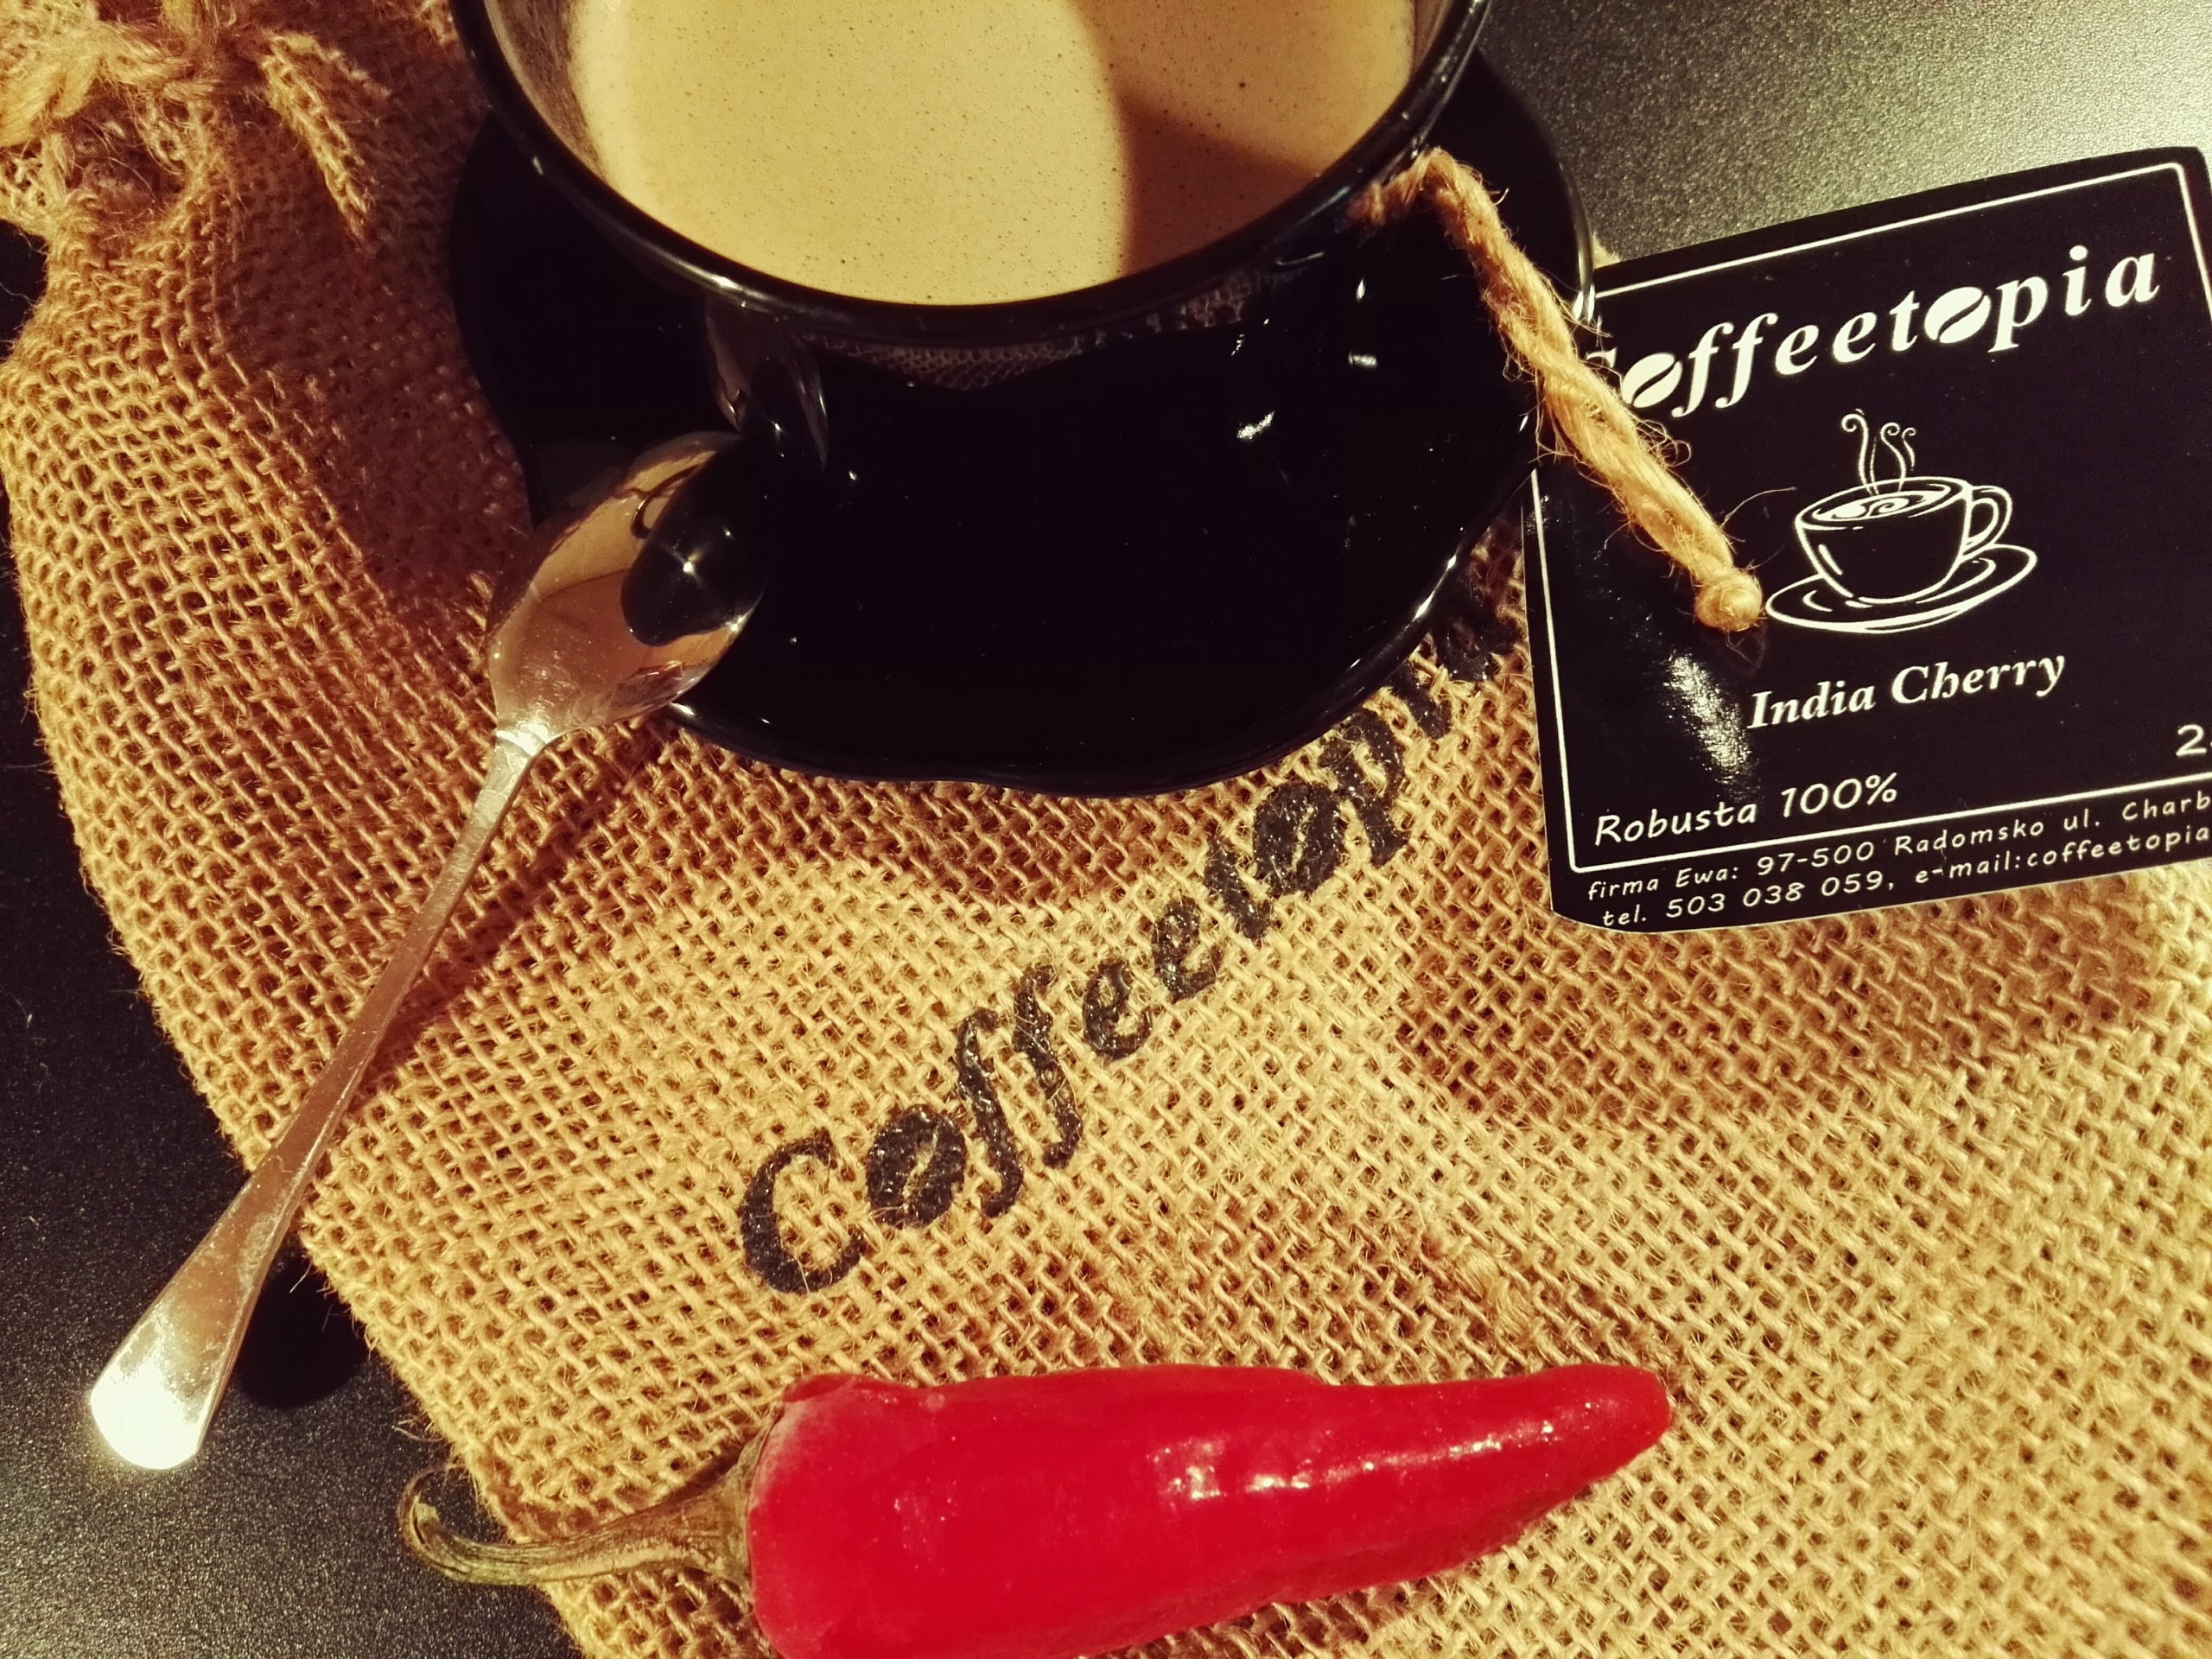 Coffeetopia INDIA CHERRY 0,25kg